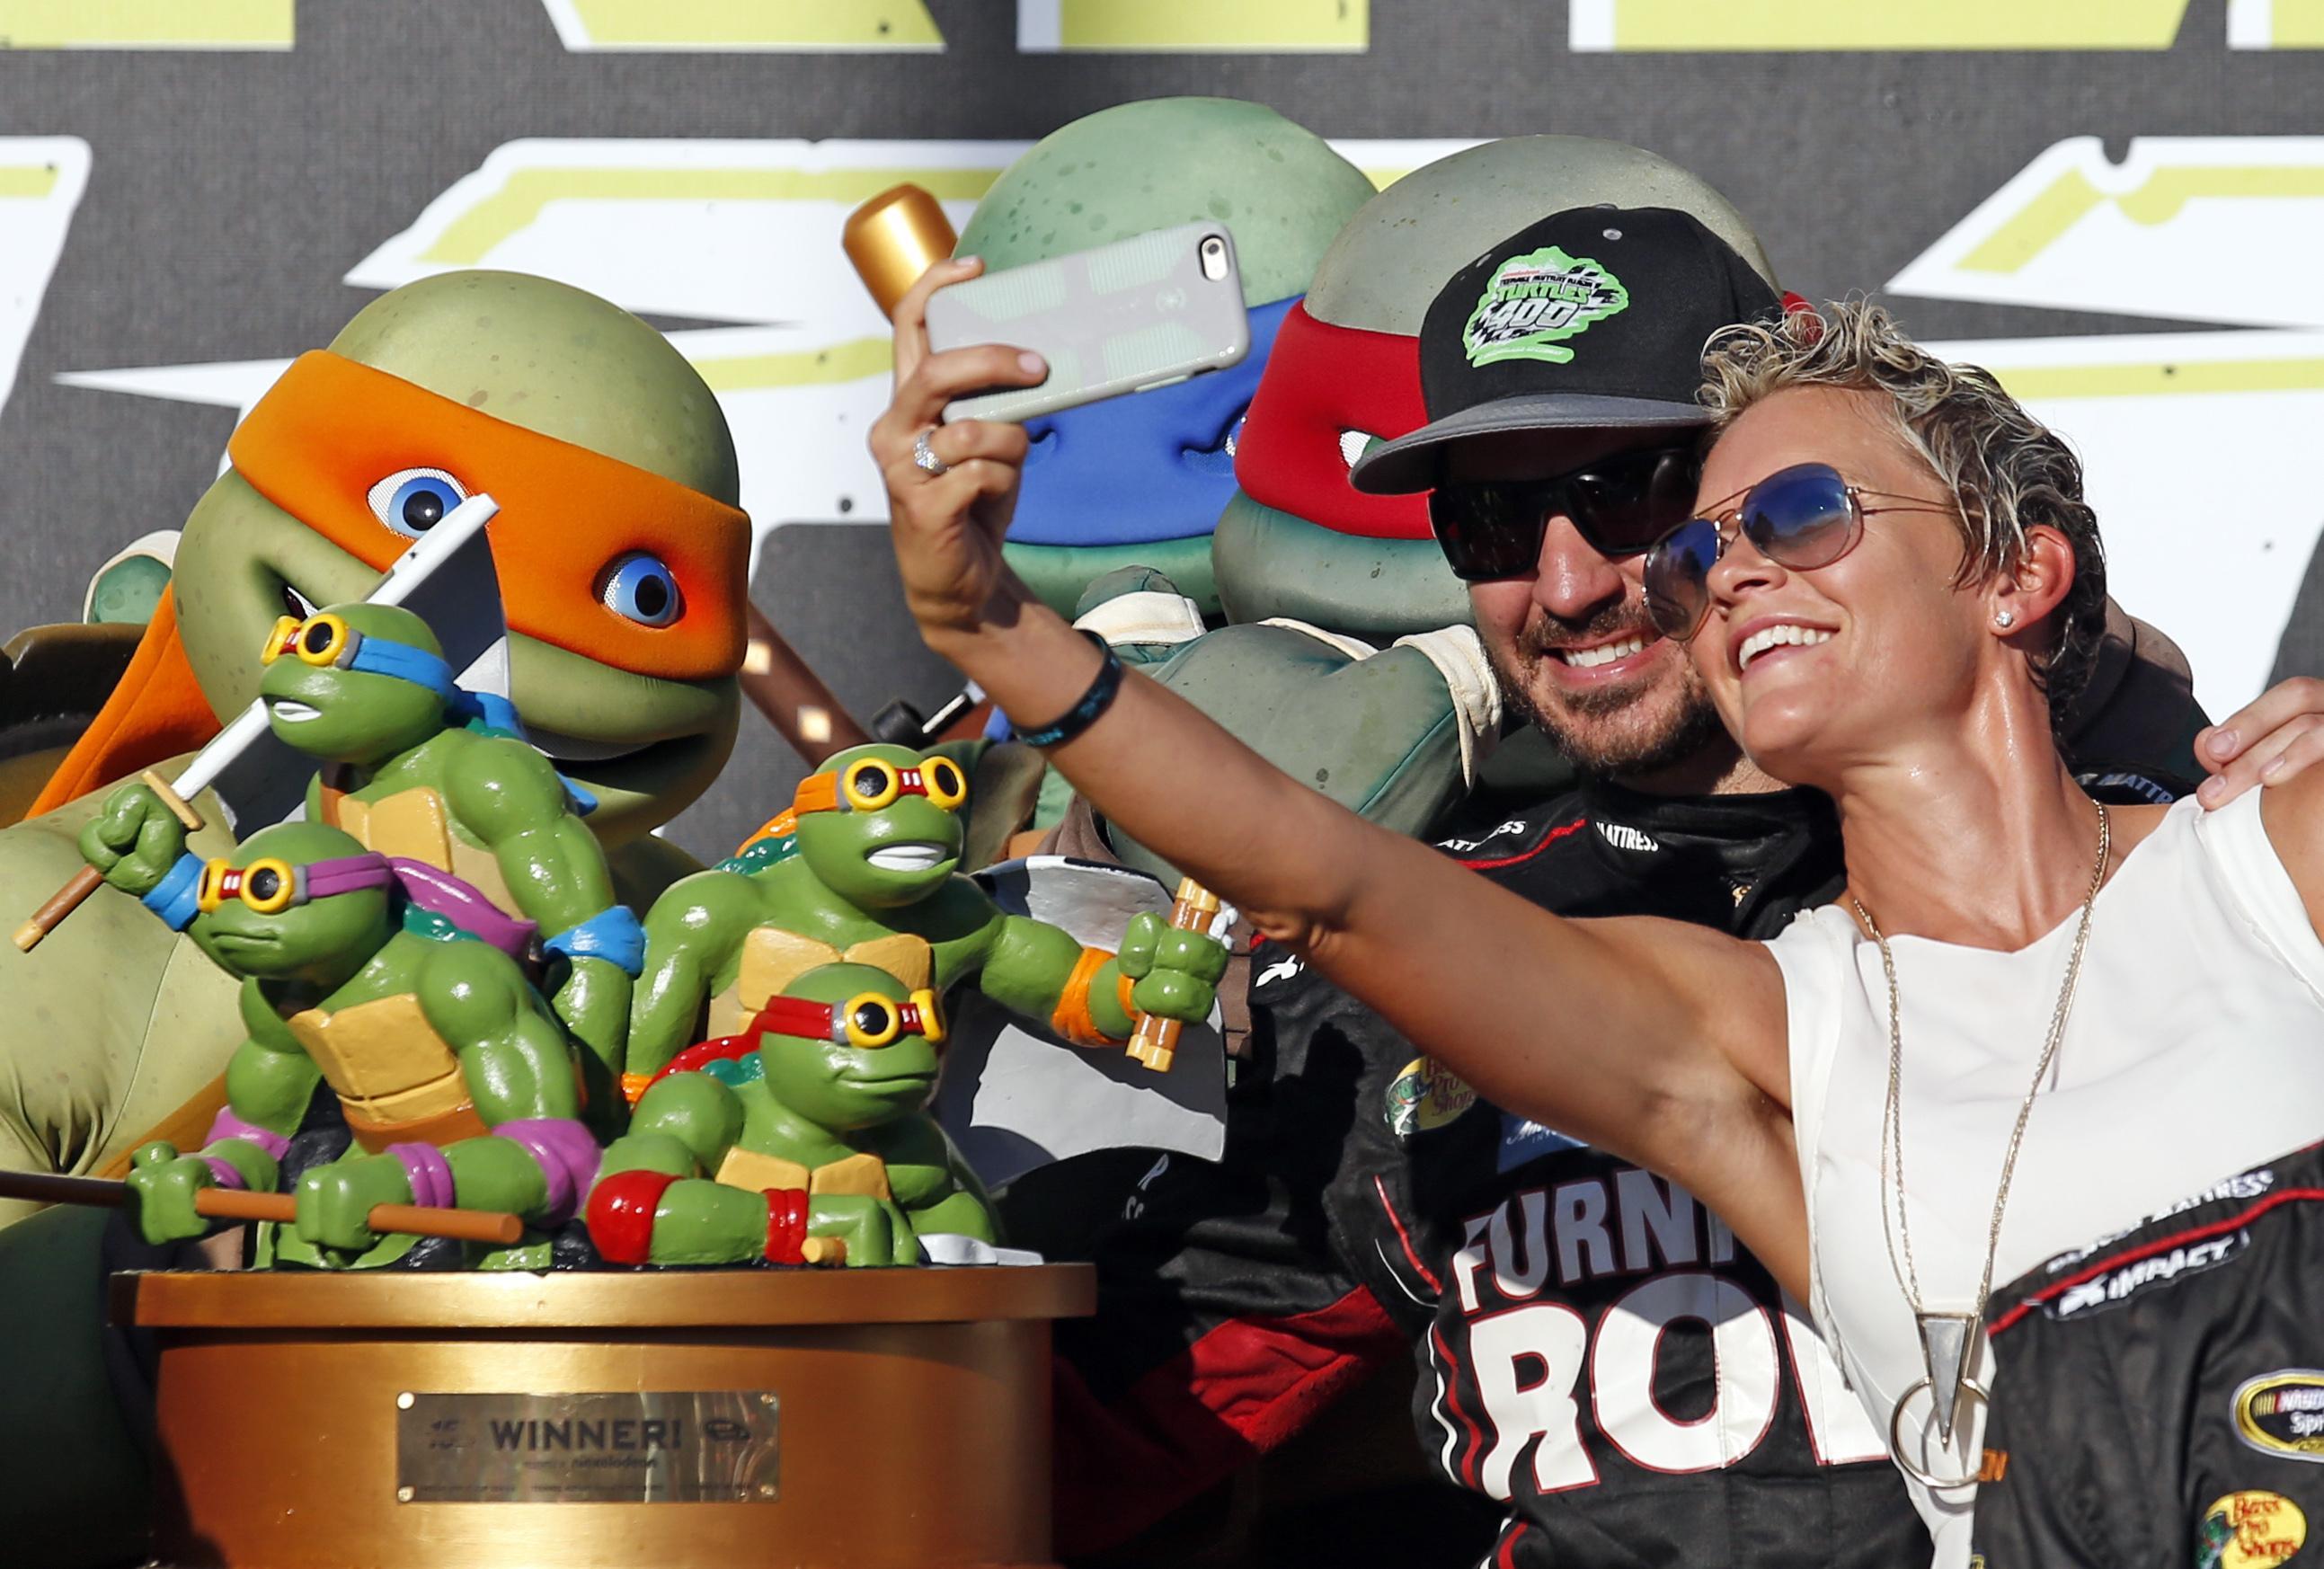 Stafford's Martin Truex Jr. Wins His Third Race This Season At Chicagoland